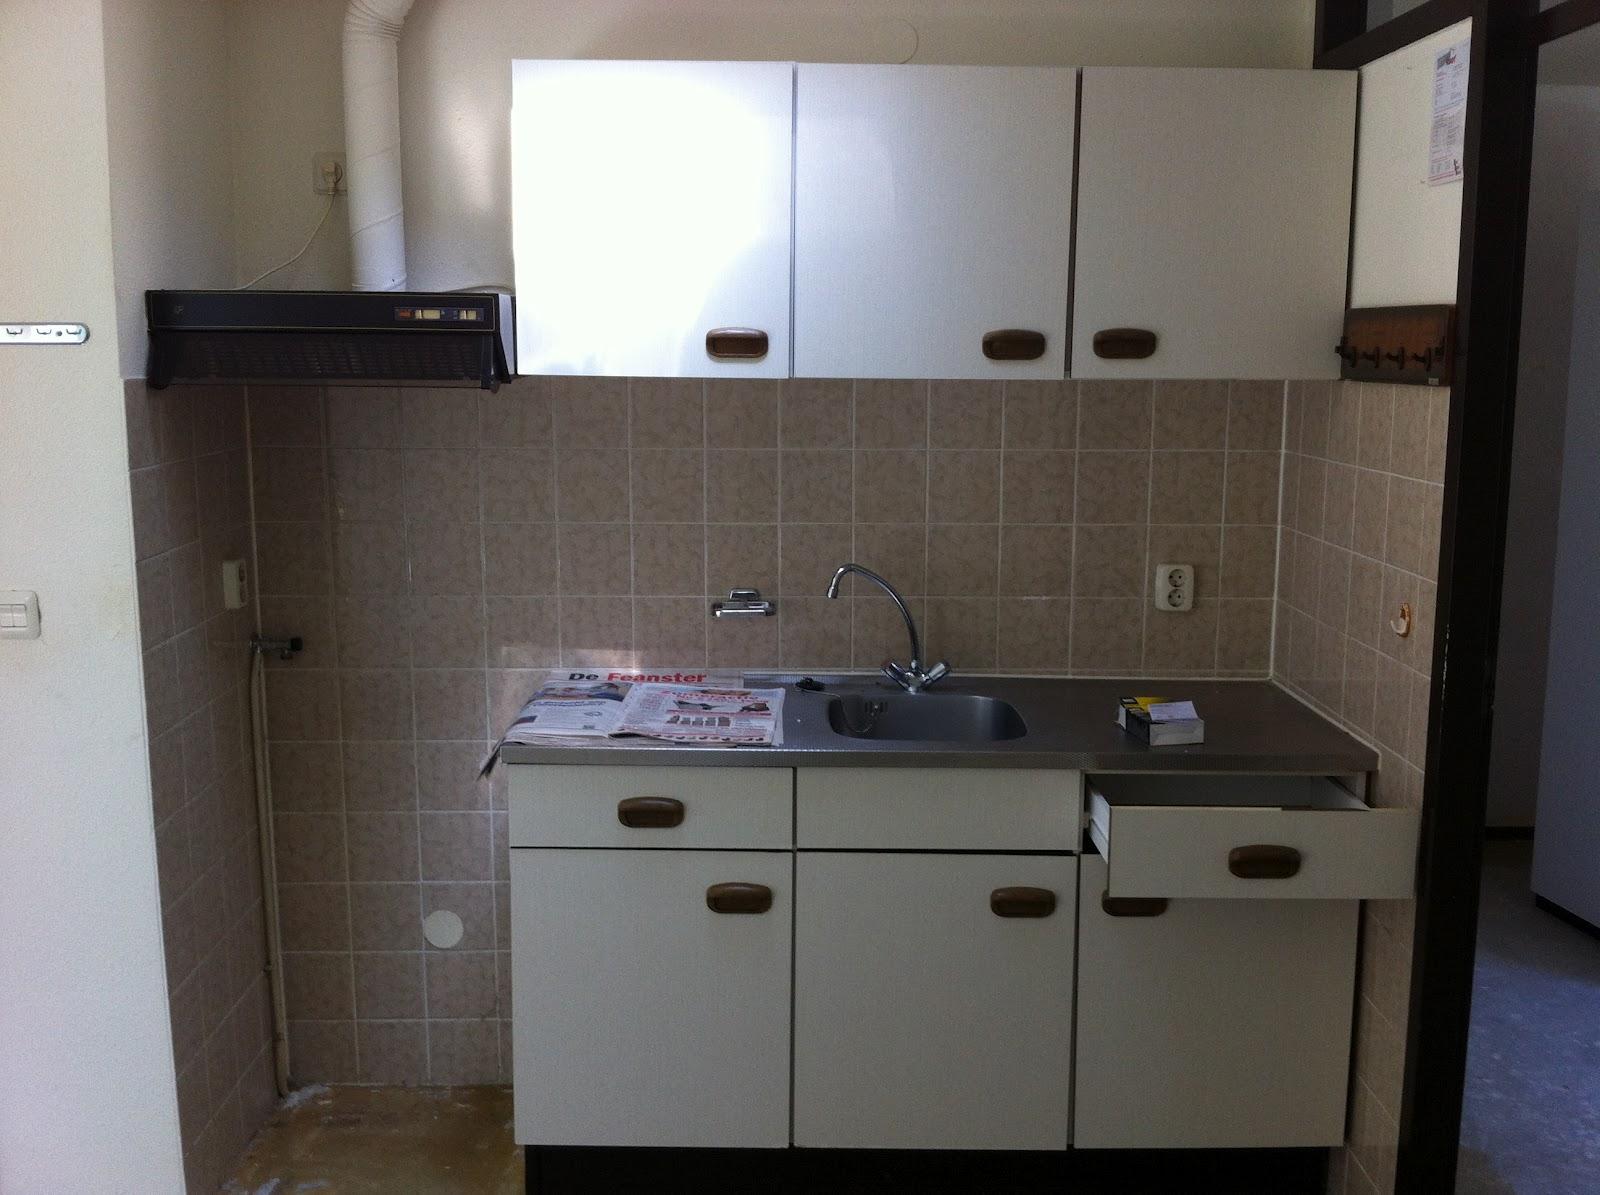 Blogarchief tineke veenstra house tour - Deco oude keuken ...